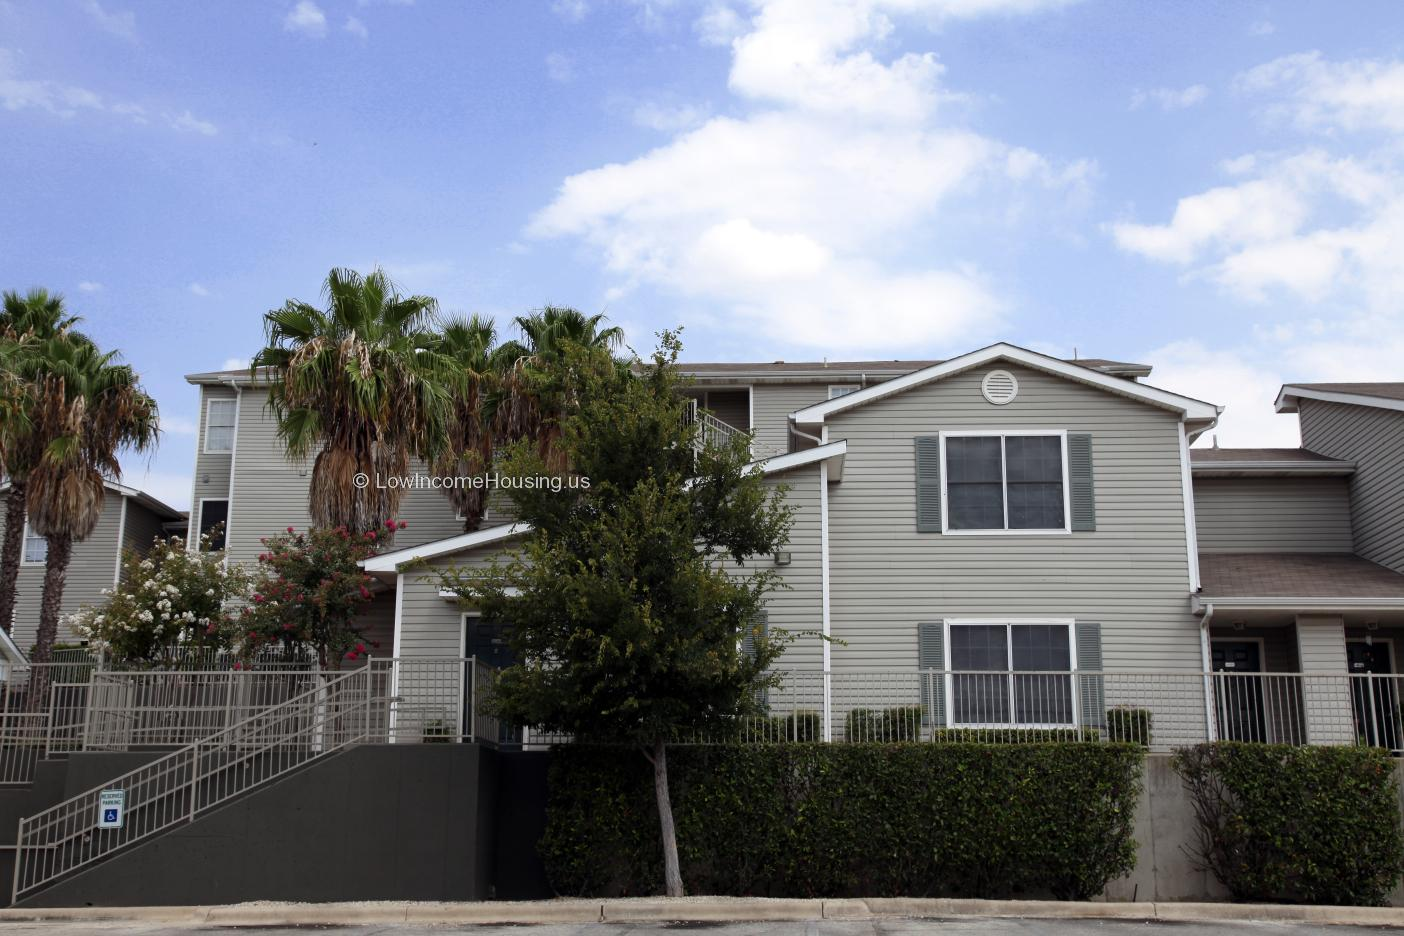 Douglas Landing ApartmentsAustin TX Low Income Housing   Austin Low Income Apartments   Low  . Low Income Apartments In San Marcos Tx. Home Design Ideas